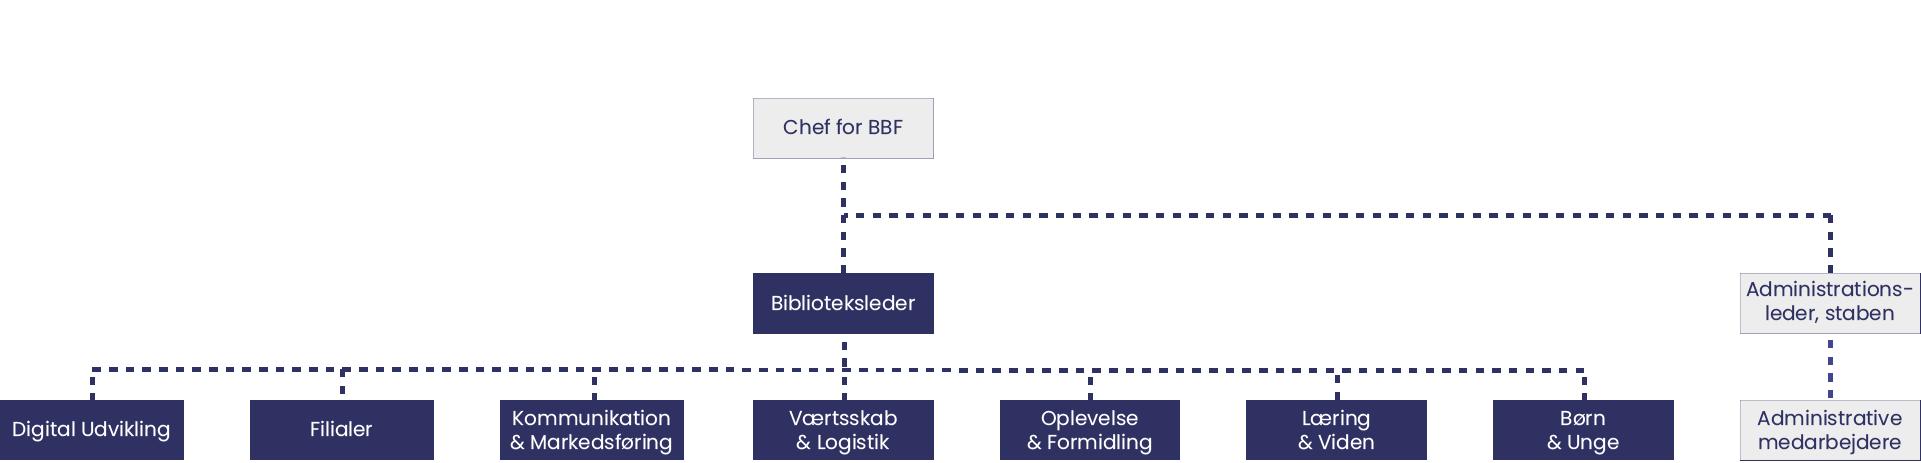 Opdateret organisationsdiagram